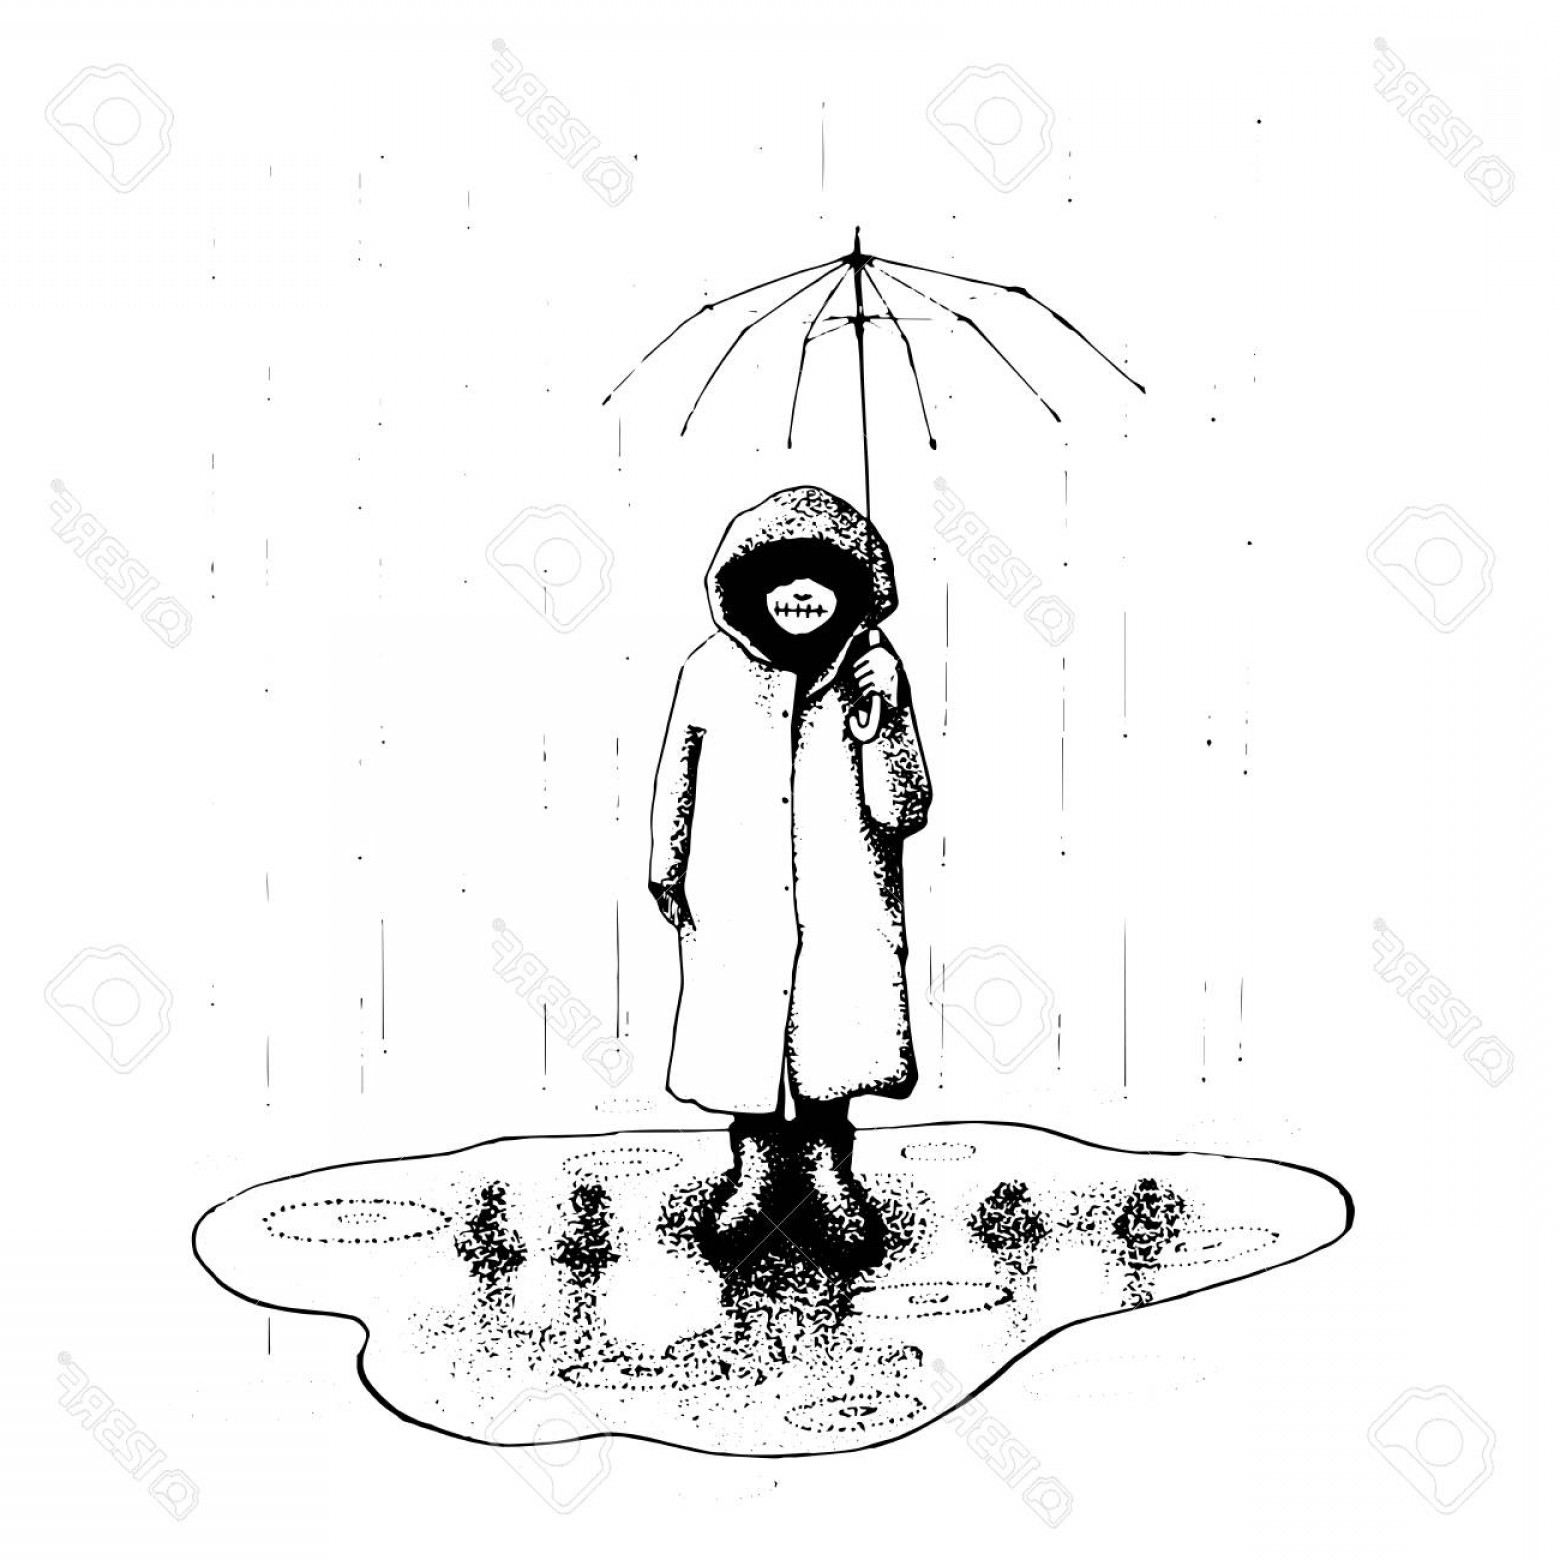 1560x1560 Photostock Vector Girl Stand Alone In The Rain With Umbrella